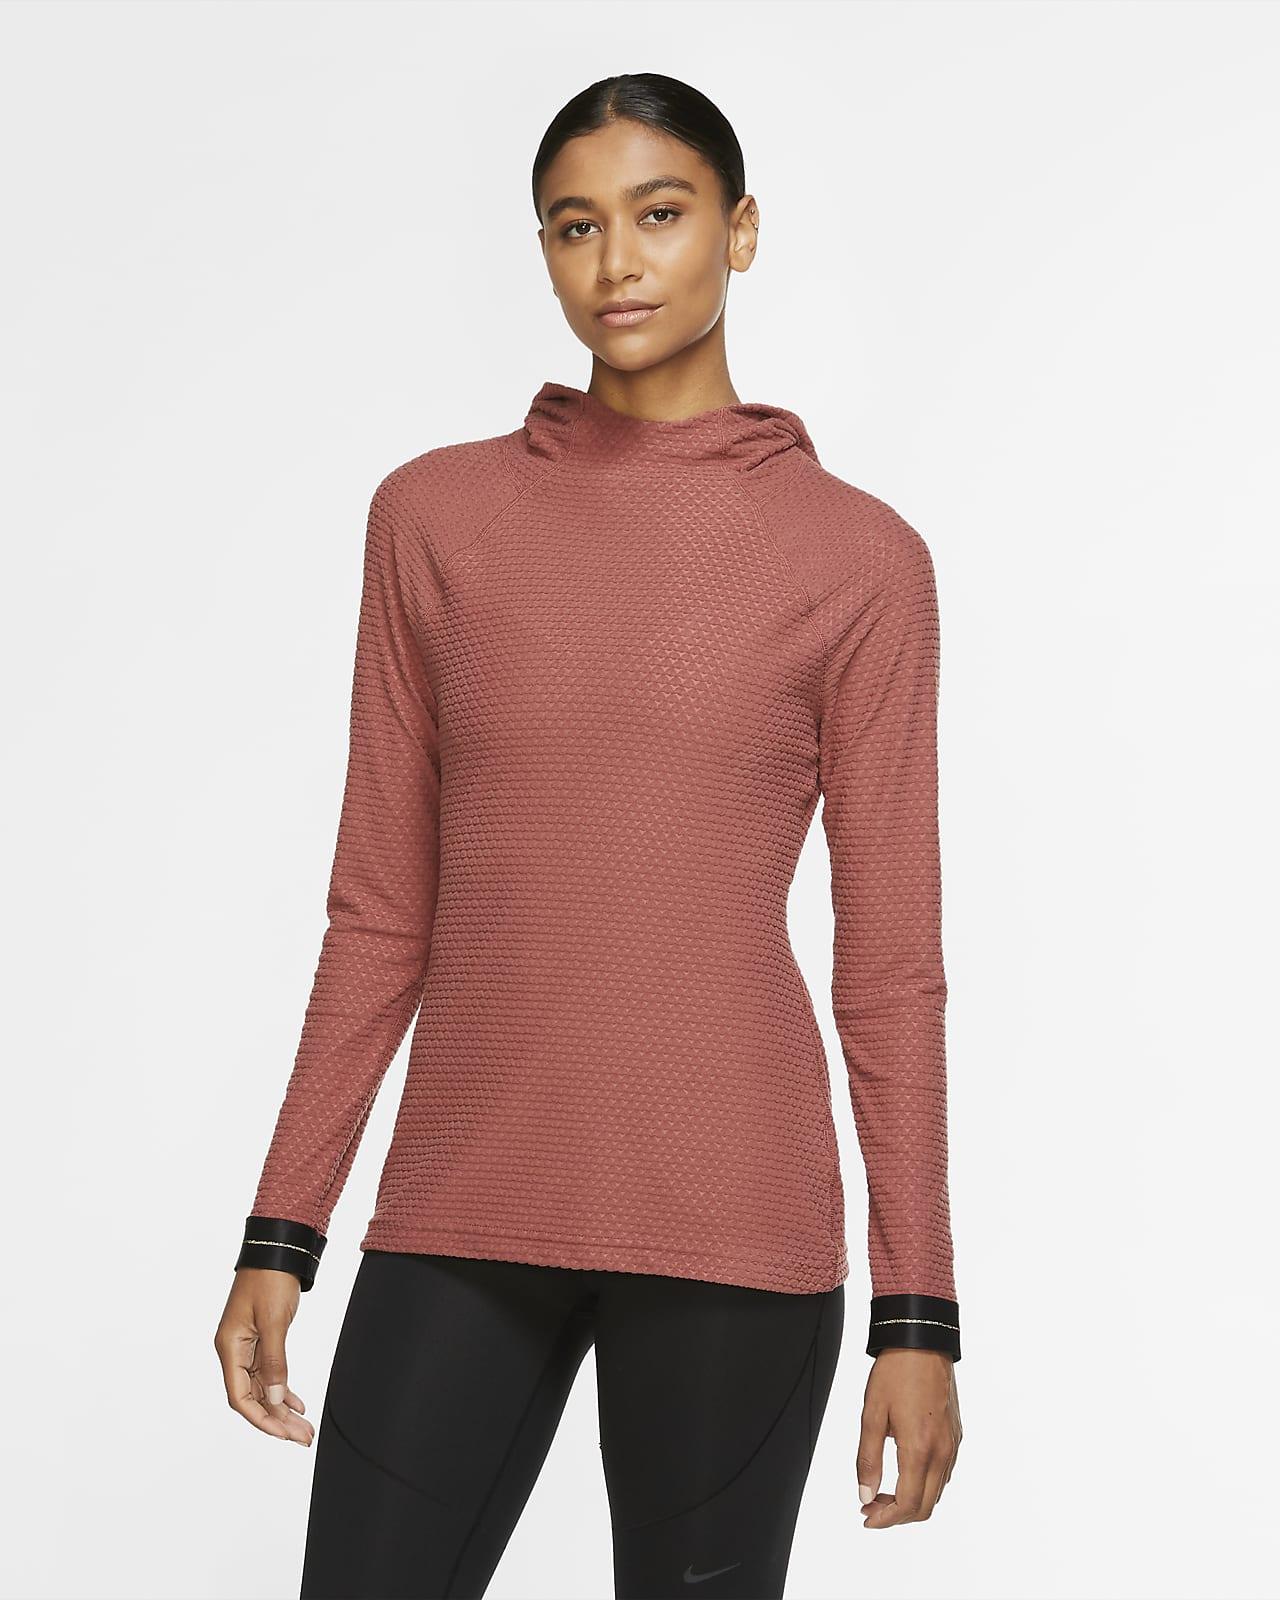 Nike Pro Icon Clash Women's Hooded Long-Sleeve Top